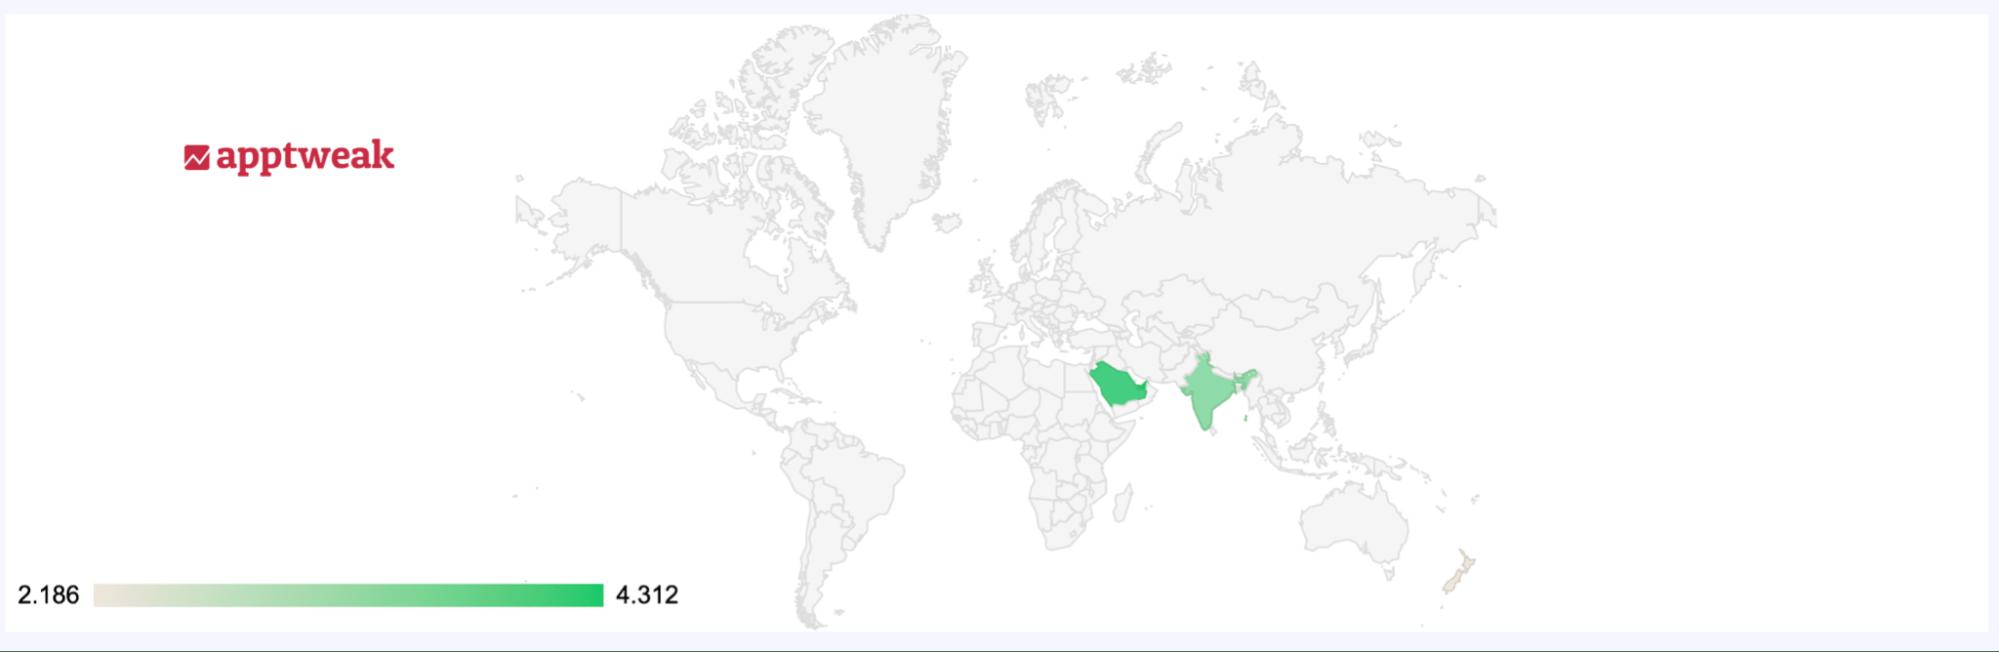 Google Play algorithm anomaly in India and Saudi Arabia